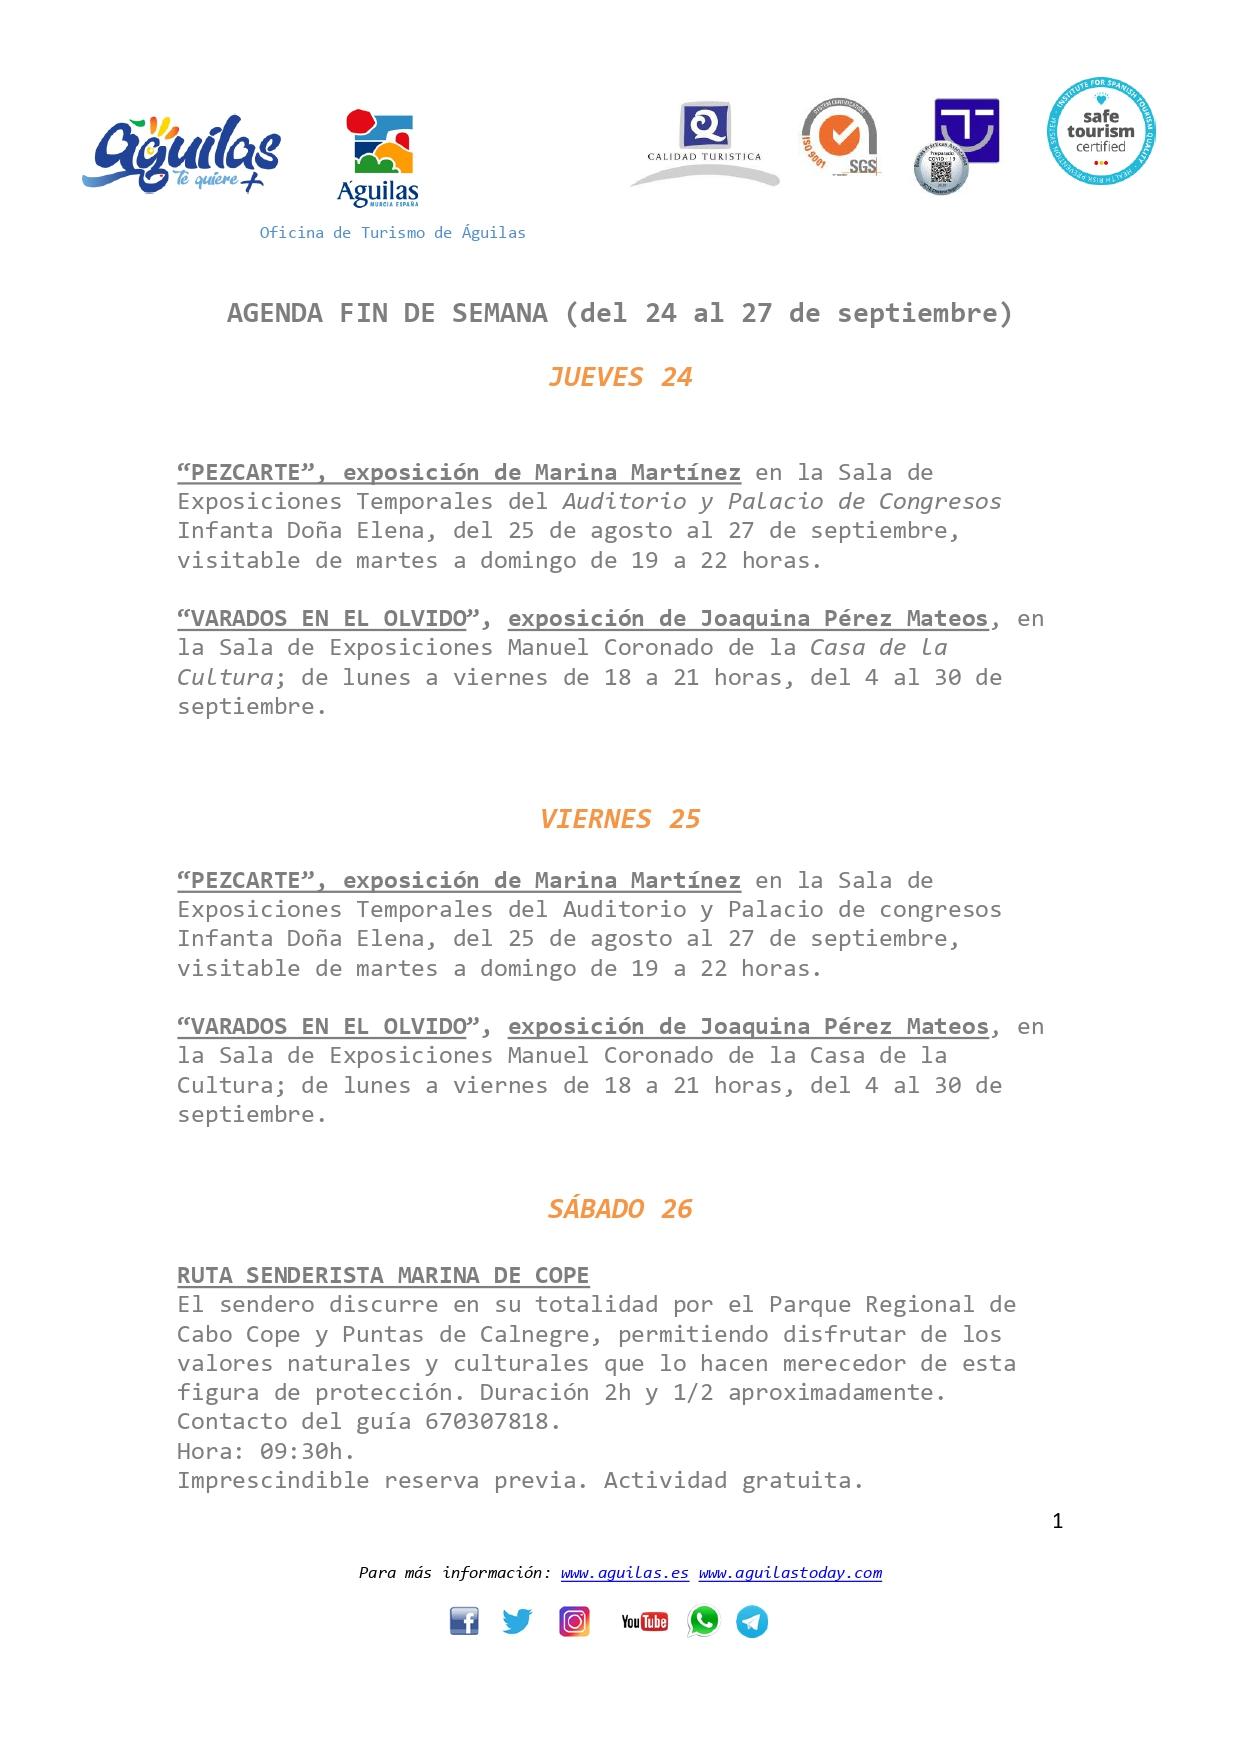 pdf_page-0001.jpg